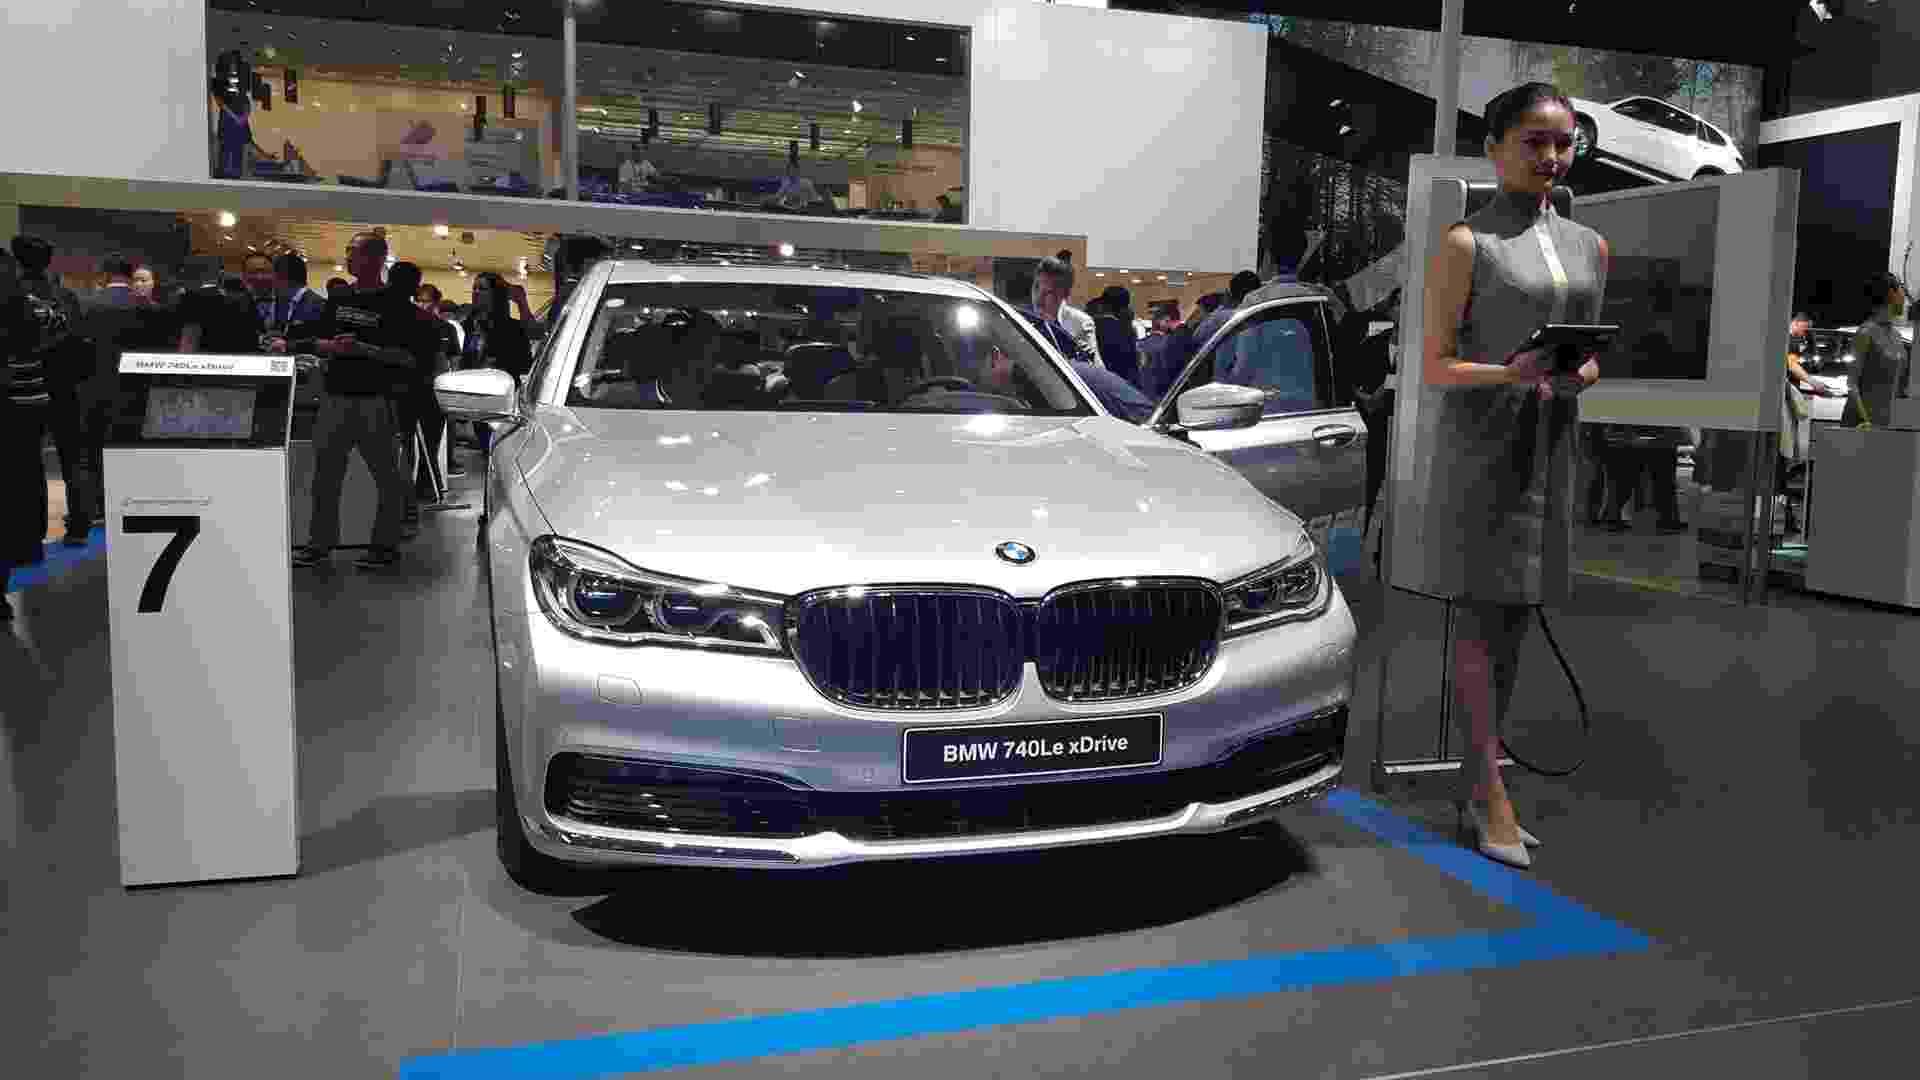 BMW 740Le xDrive - Leonardo Felix/UOL